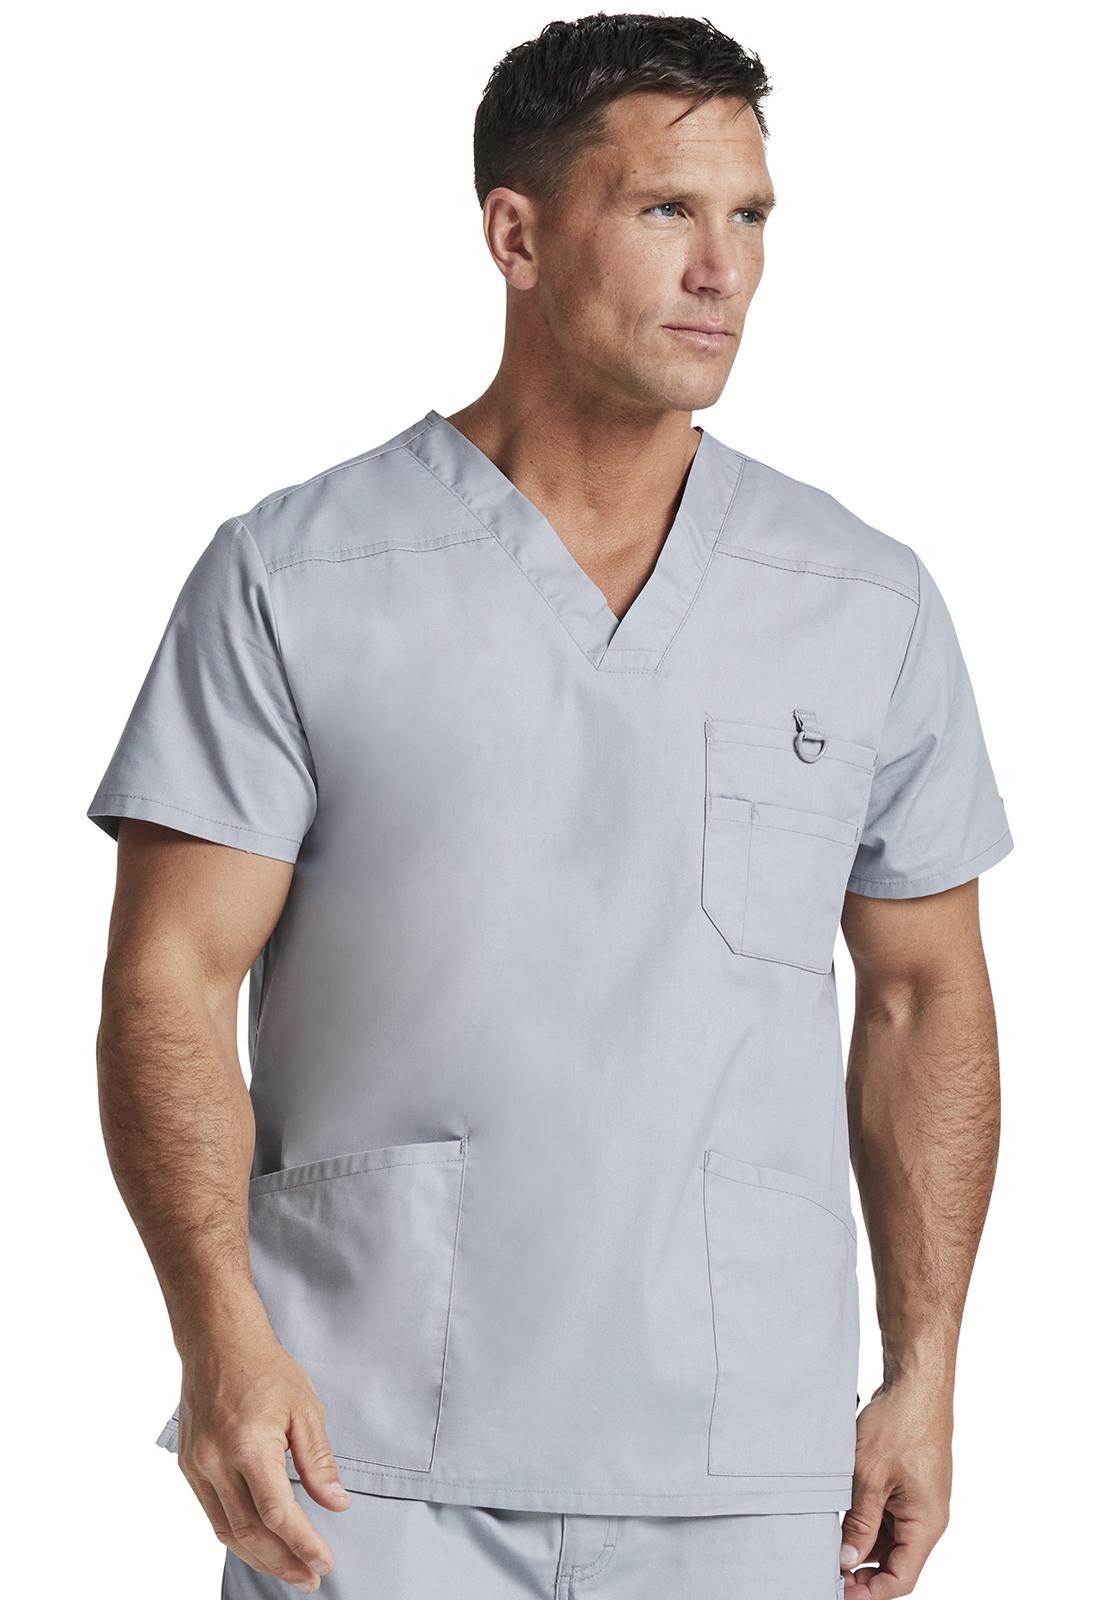 da24ac9b70c2e9 Dickies EDS Signature Men's V-Neck Top in Grey from Dickies Medical